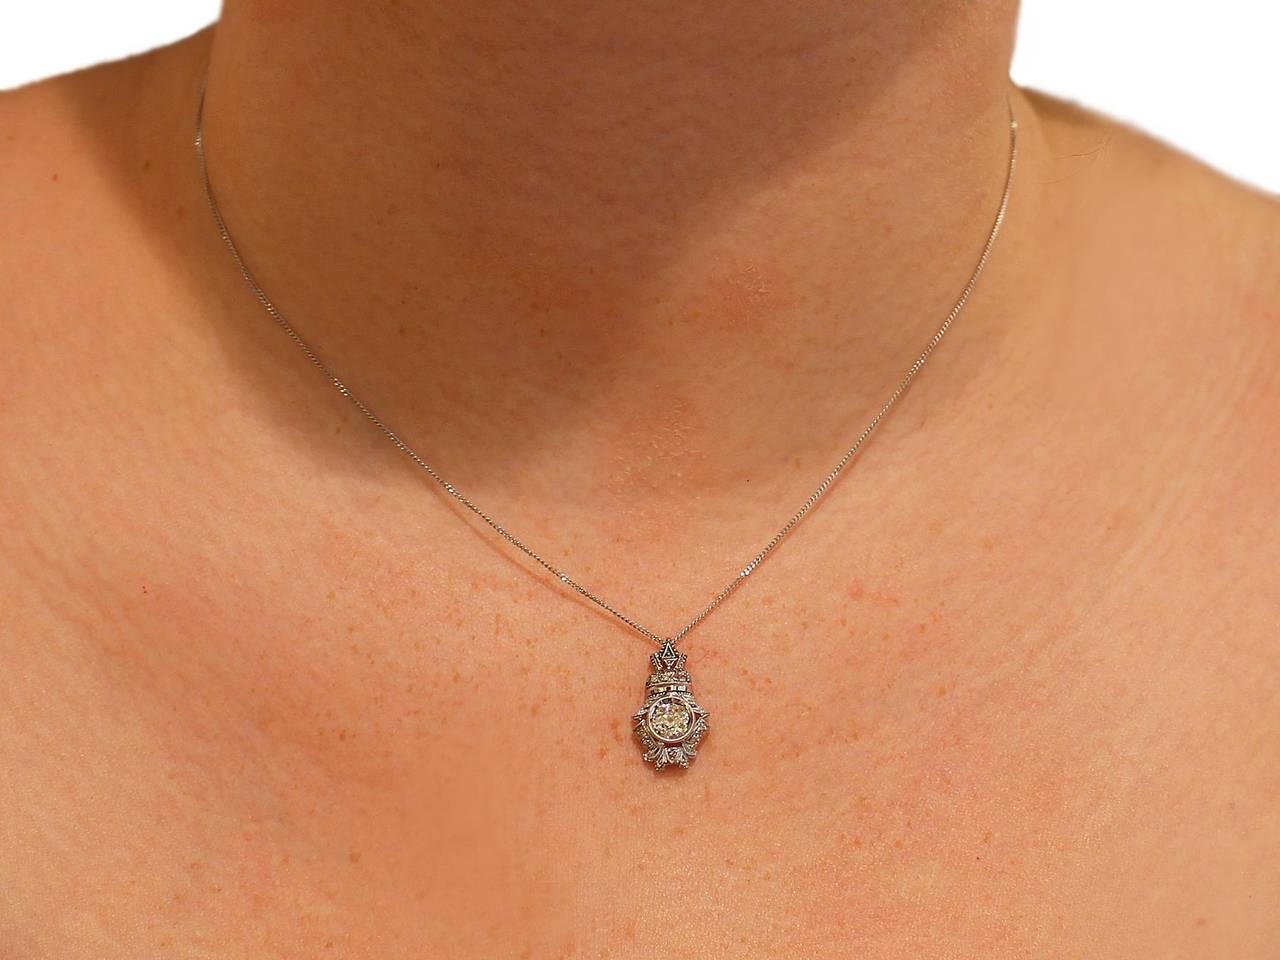 0.84 Carat Diamond and 18 Karat White Gold Pendant, Antique, circa 1900 For Sale 4